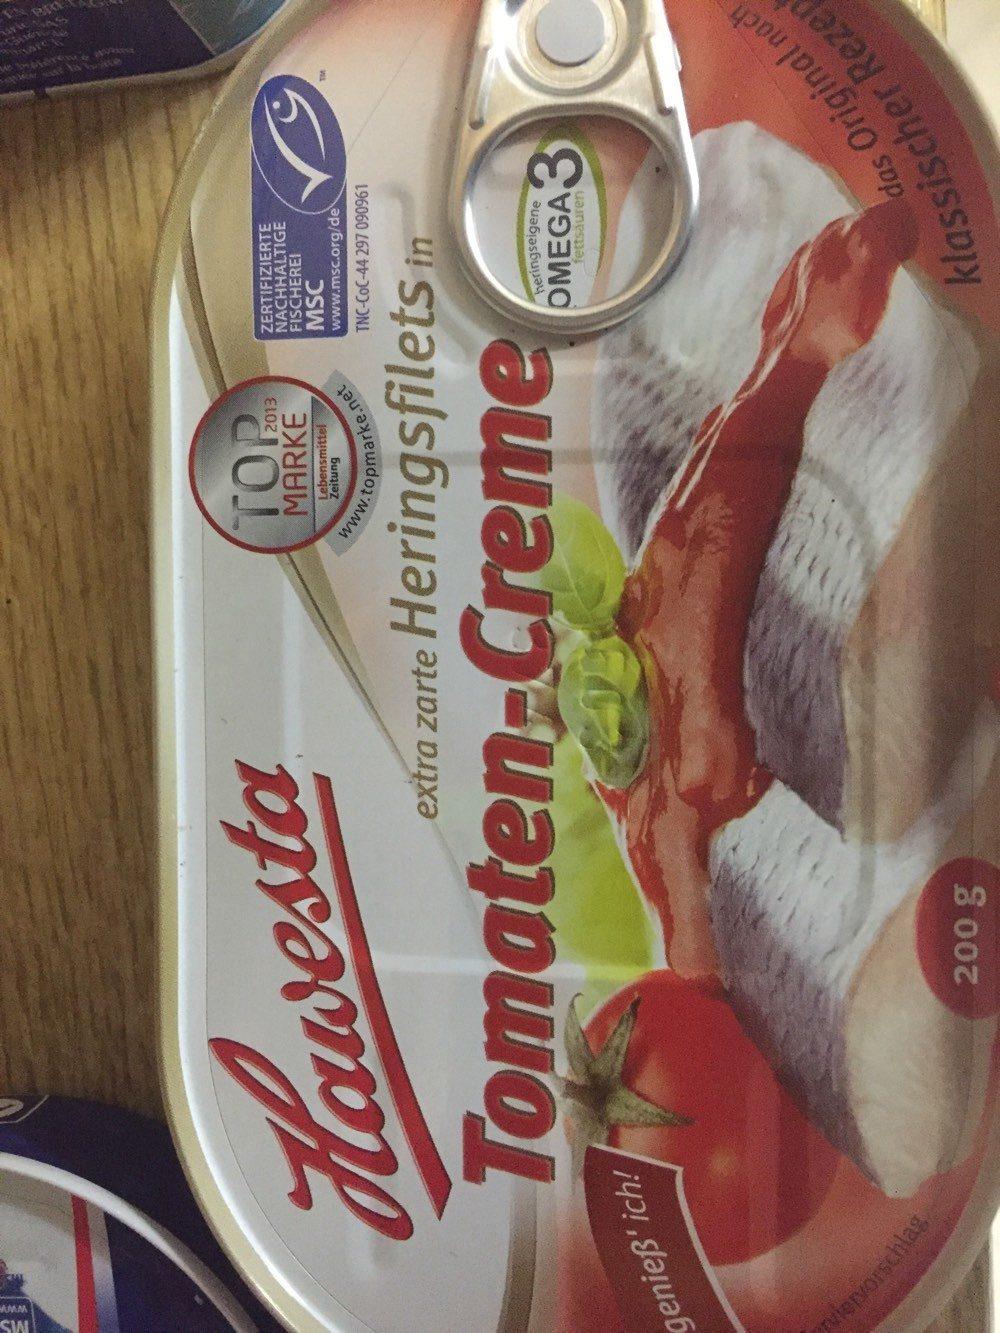 Extra zarte Heringsfilets in Tomaten-Creme - Produit - fr